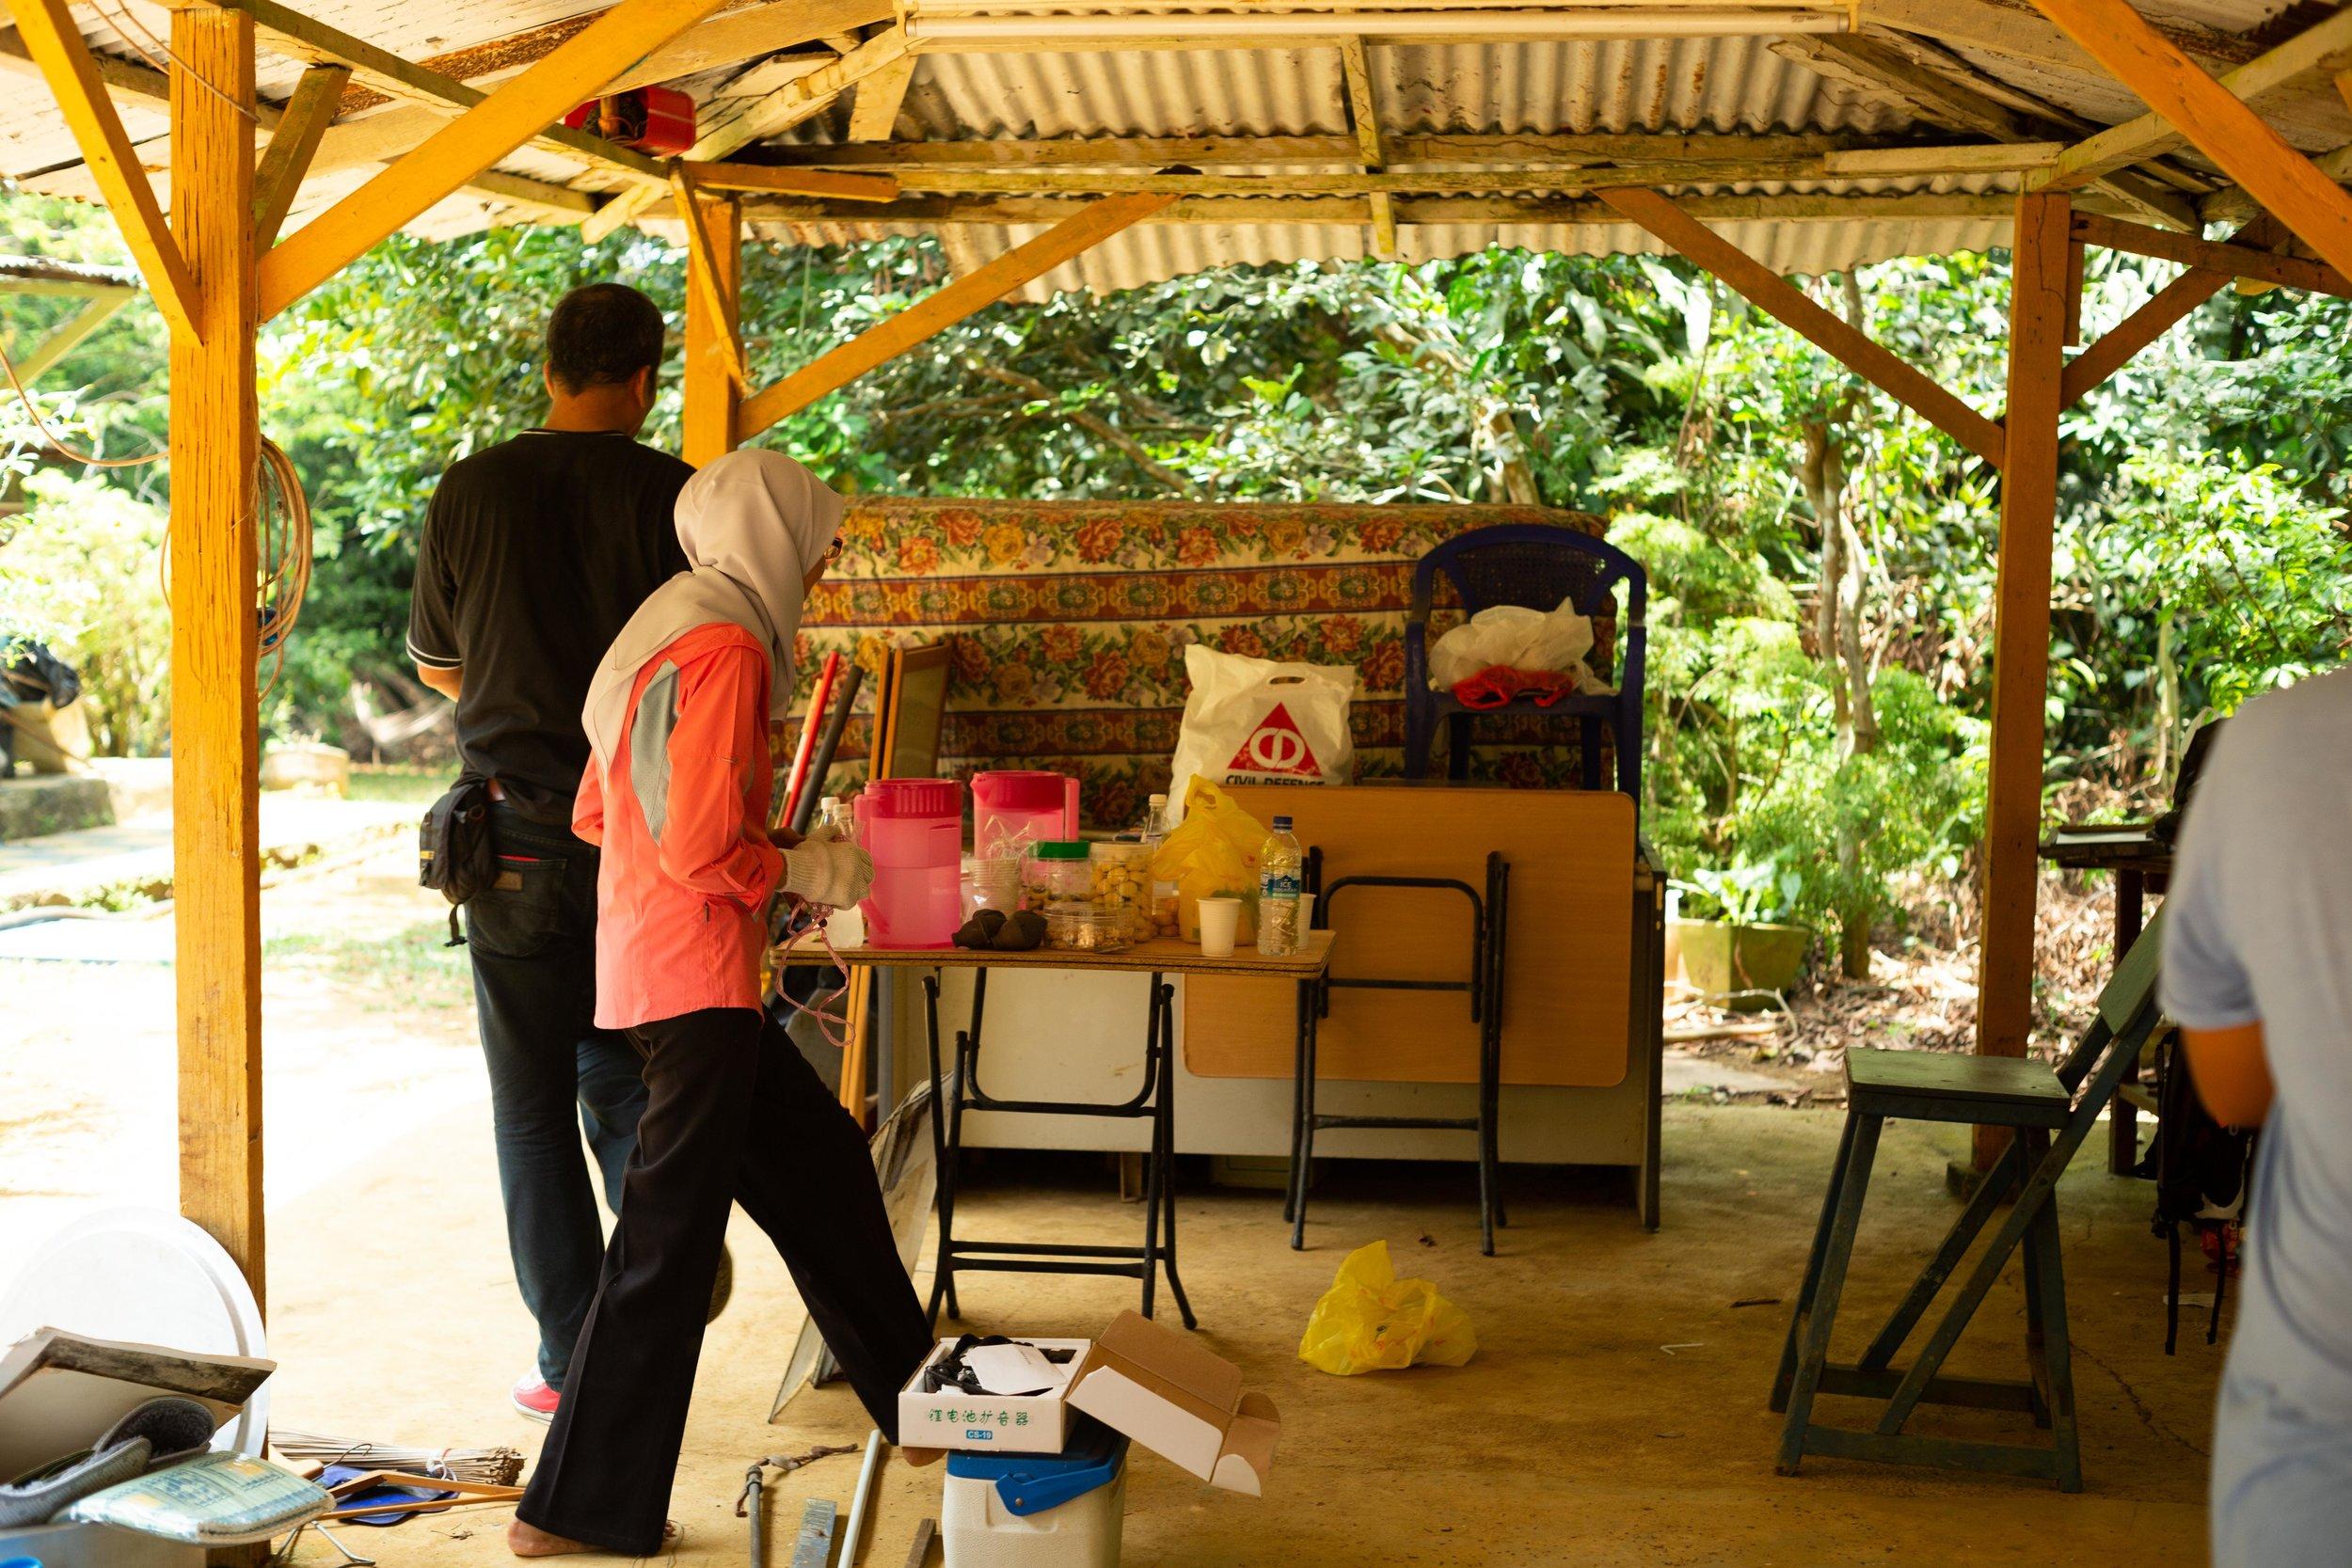 Cik Kamariah, resident of the Kampong, sorting through her belongings